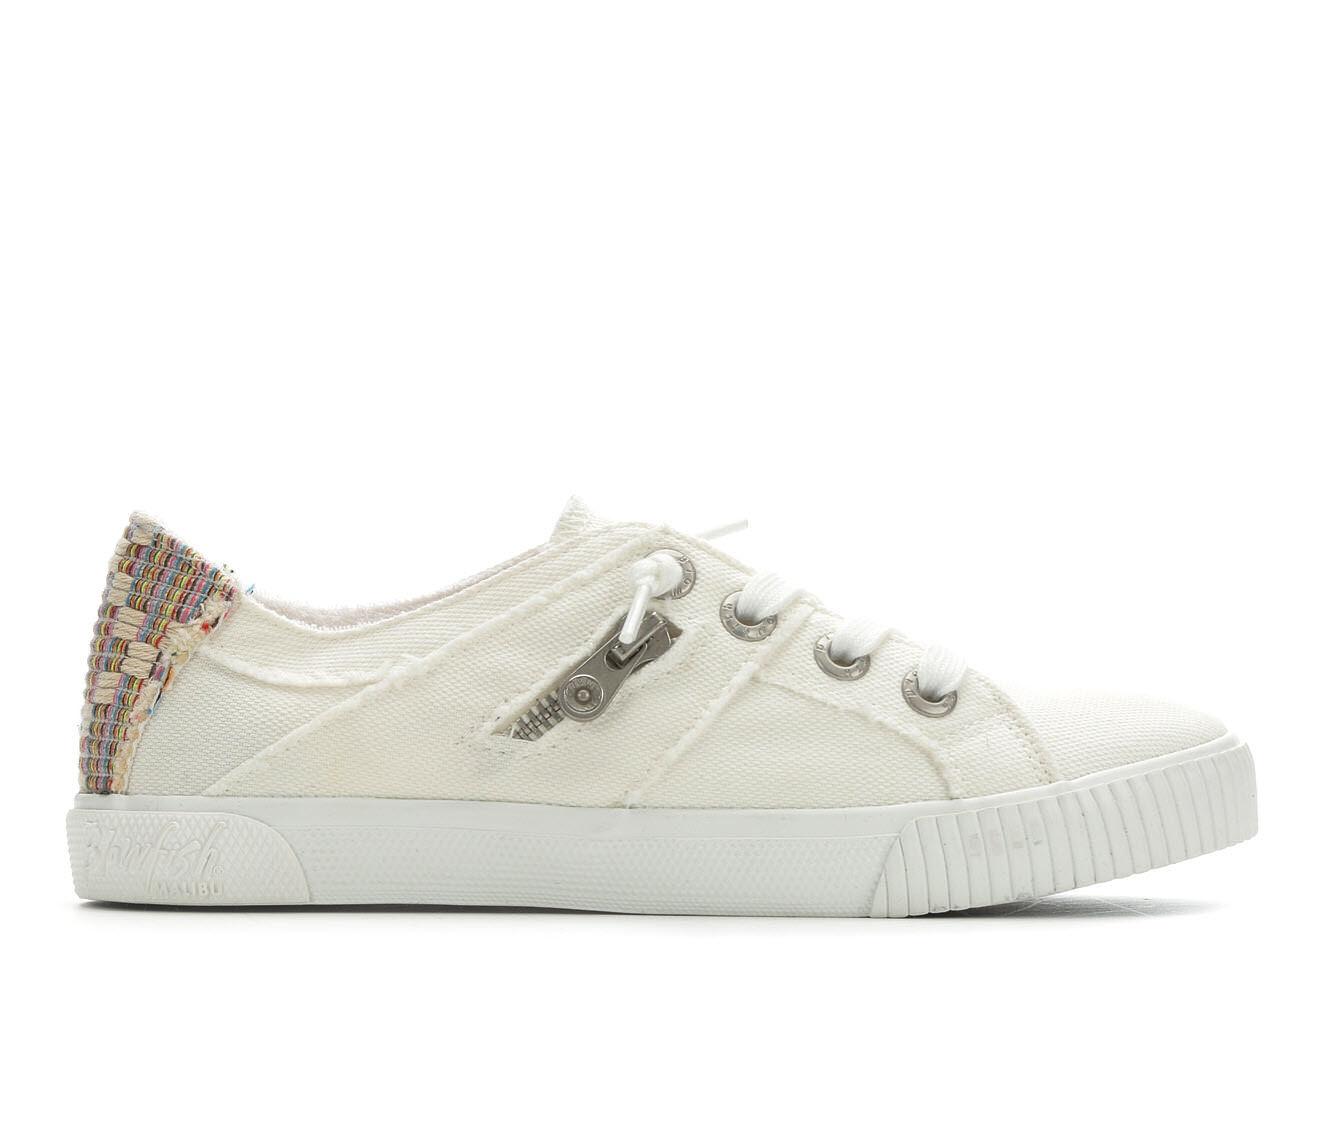 lowest price guarantee Women's Blowfish Malibu Fruit Sneakers White